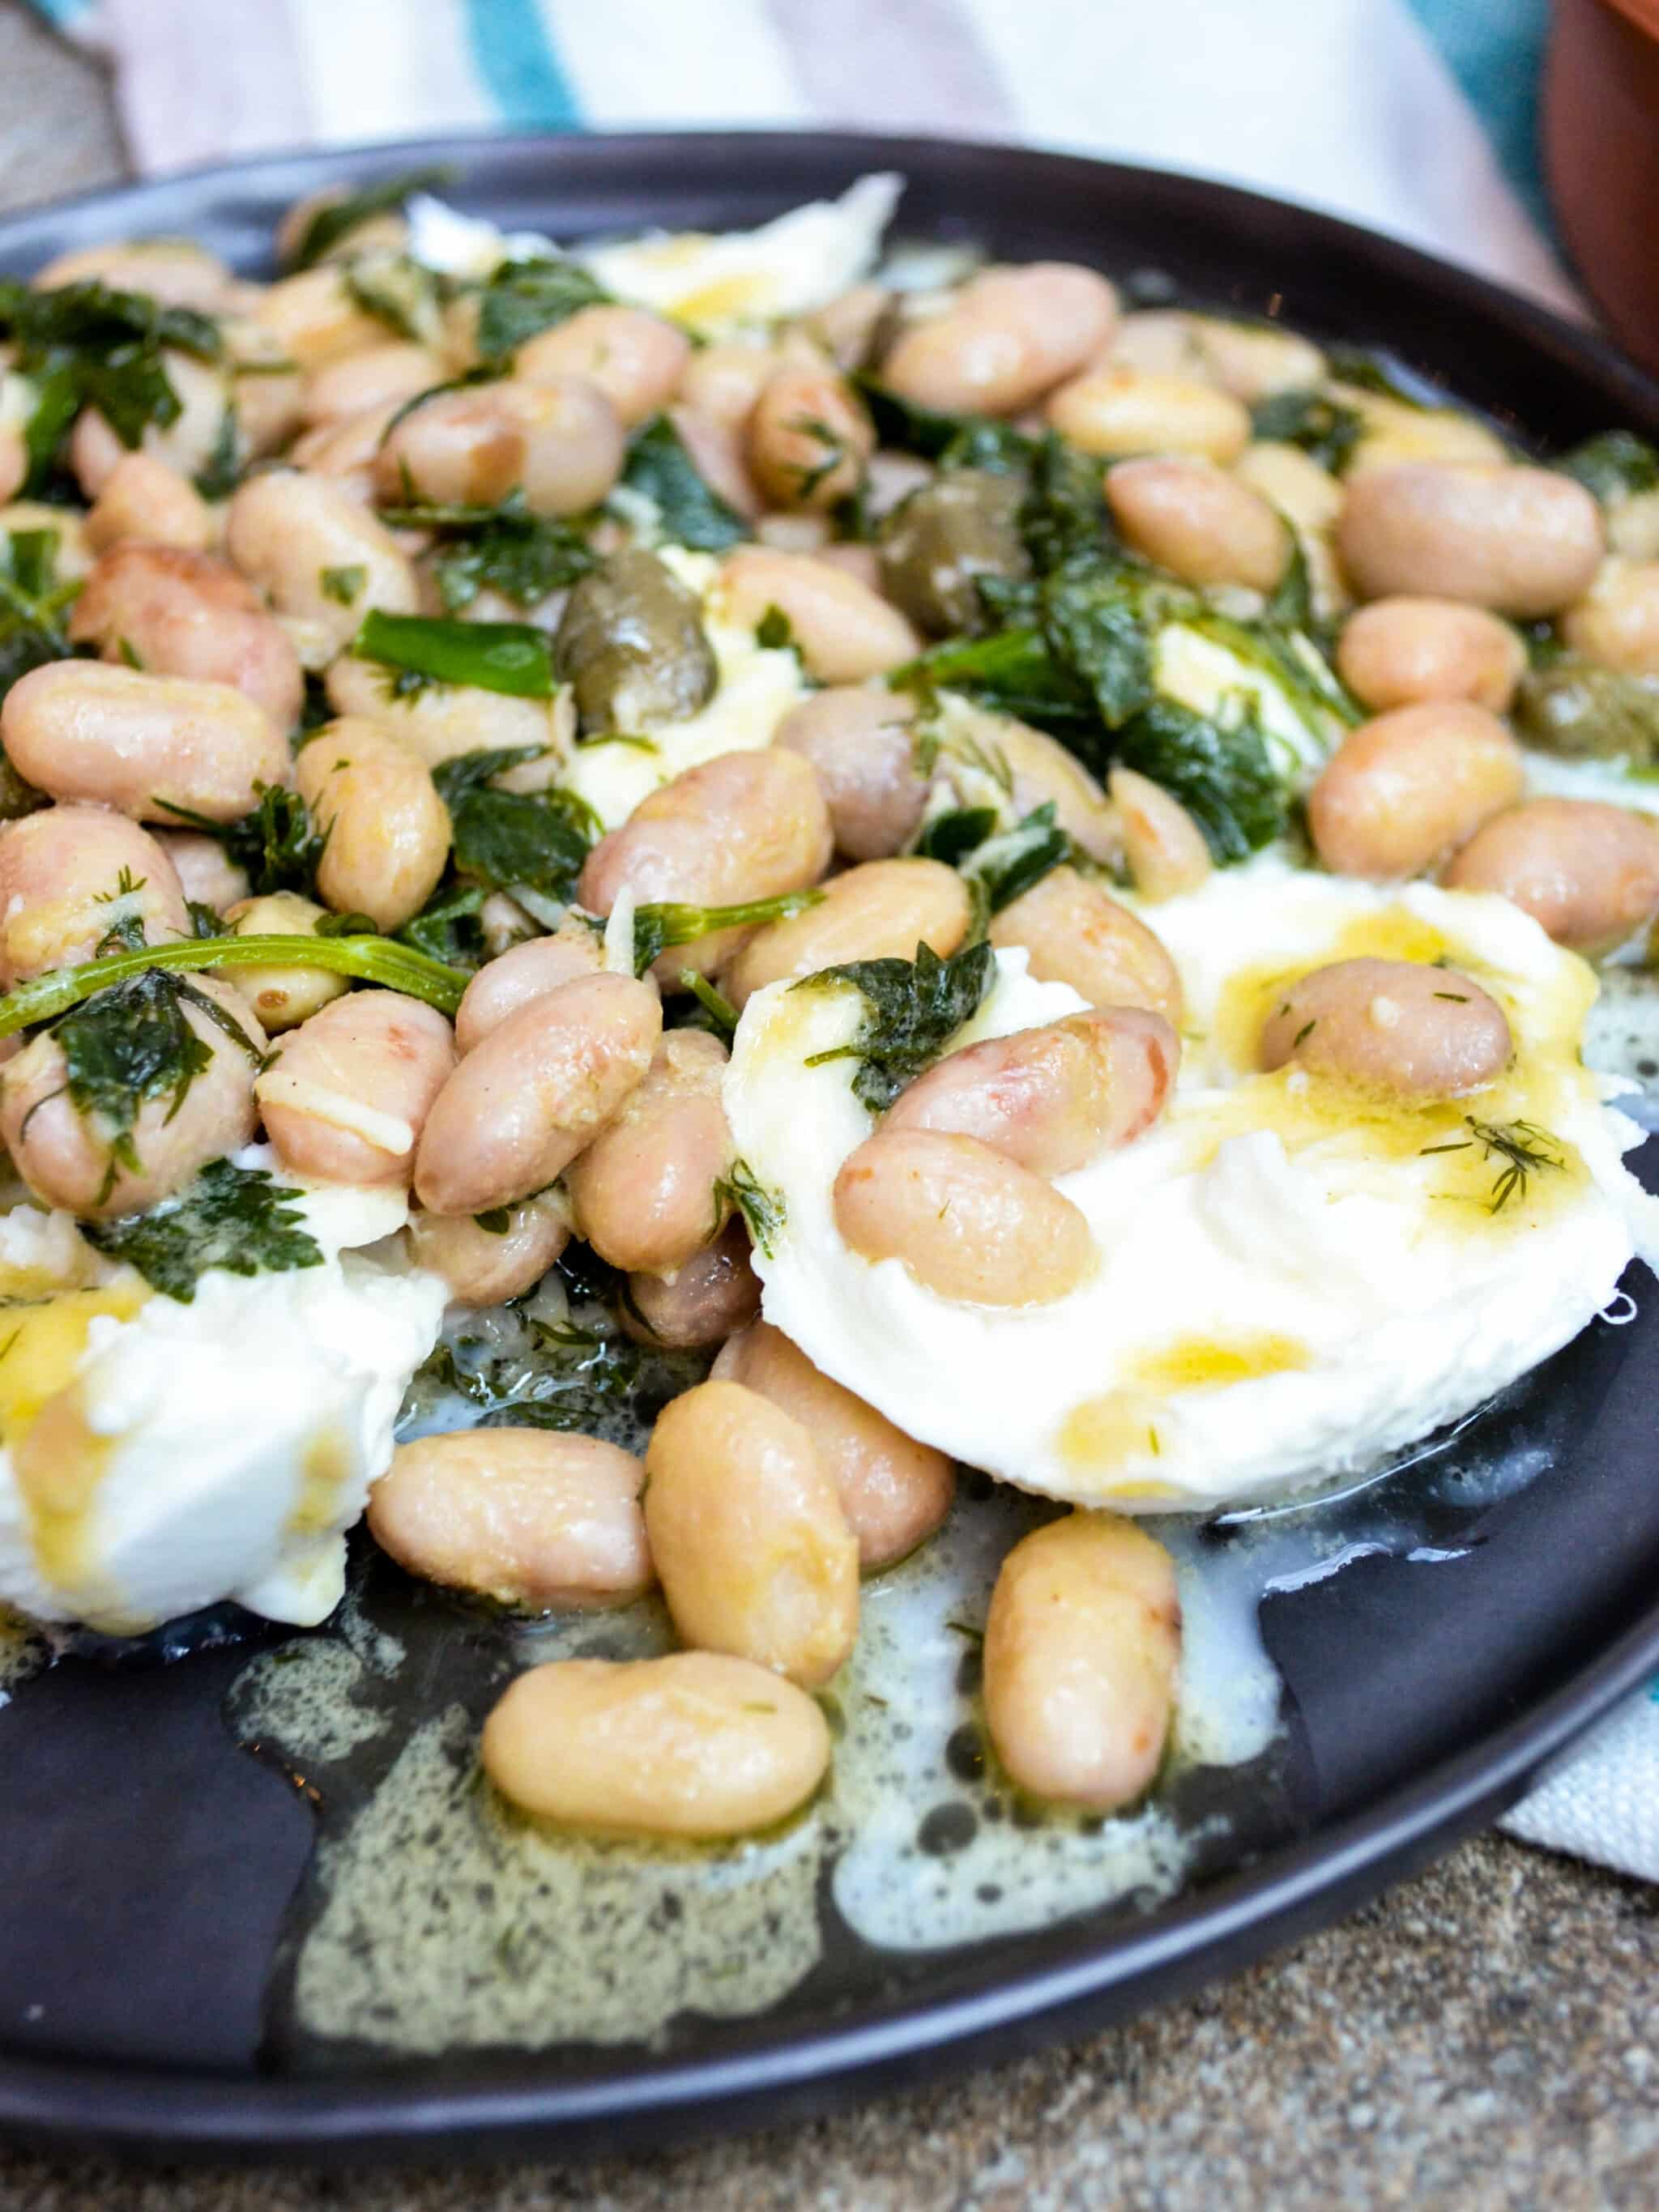 Borlotti beans with mozzarella - A kitchen in Istanbul